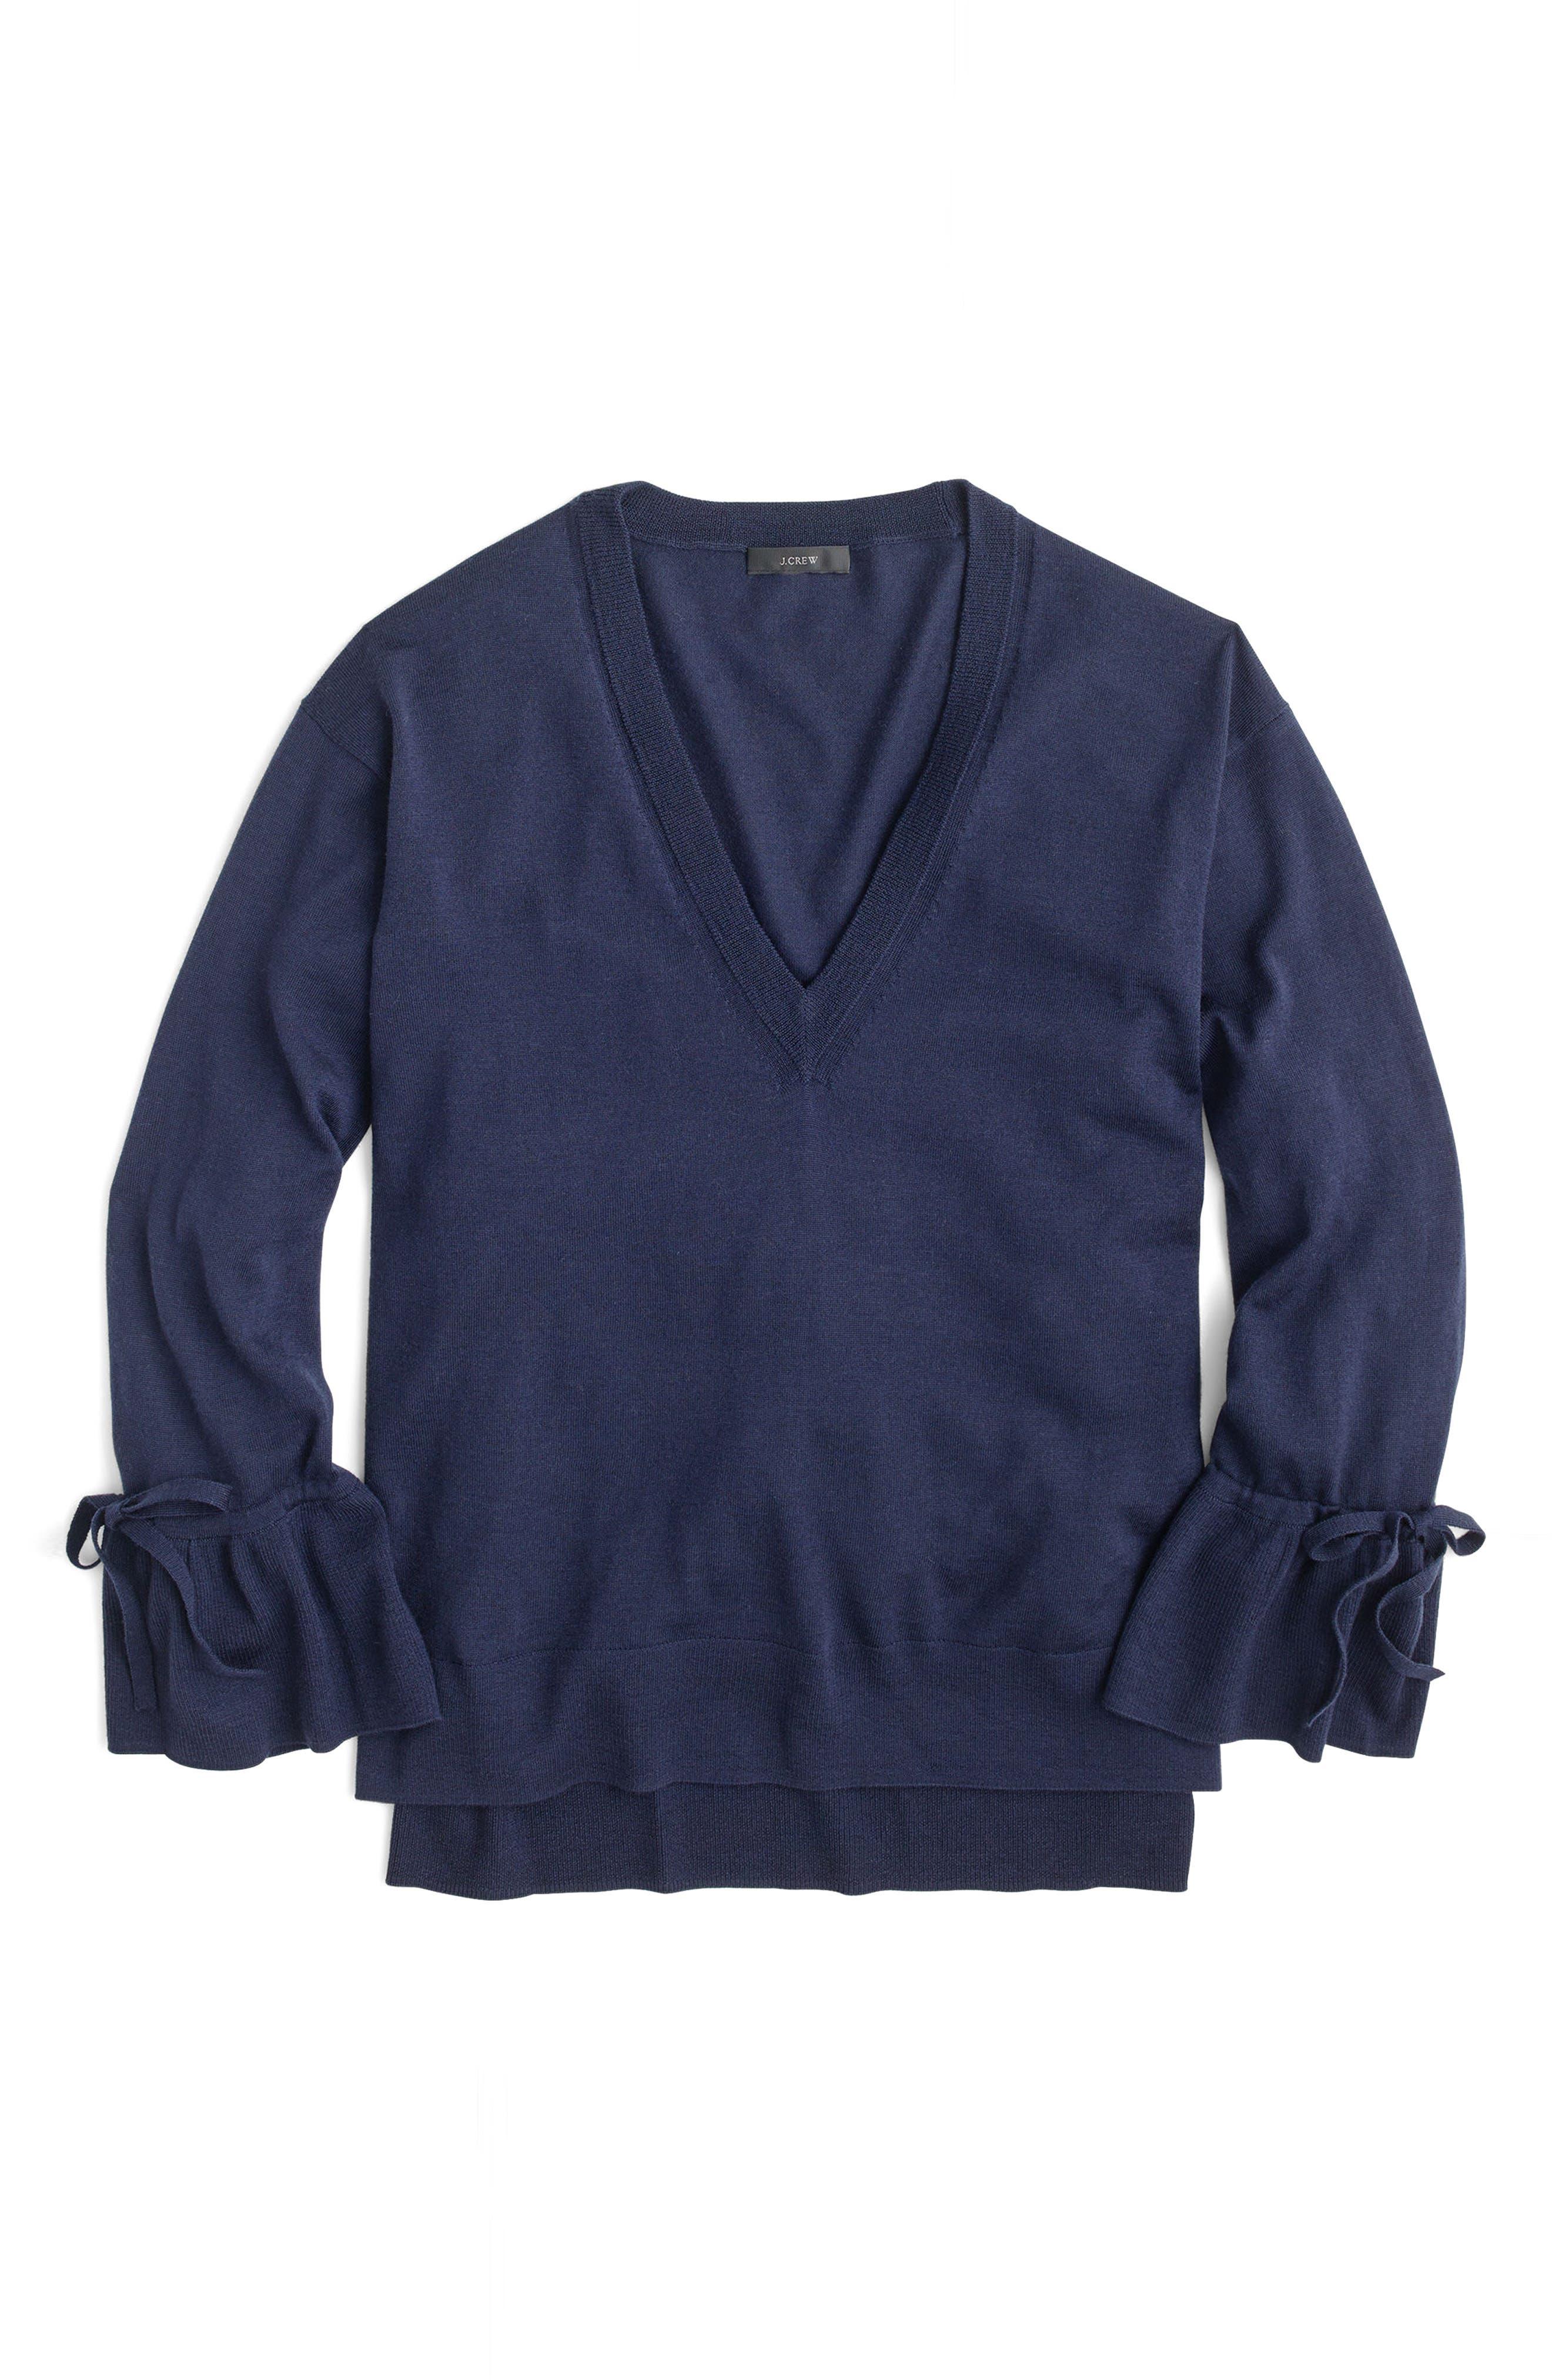 Alternate Image 3  - J.Crew Drawstring Sleeve V-Neck Merino Wool Sweater